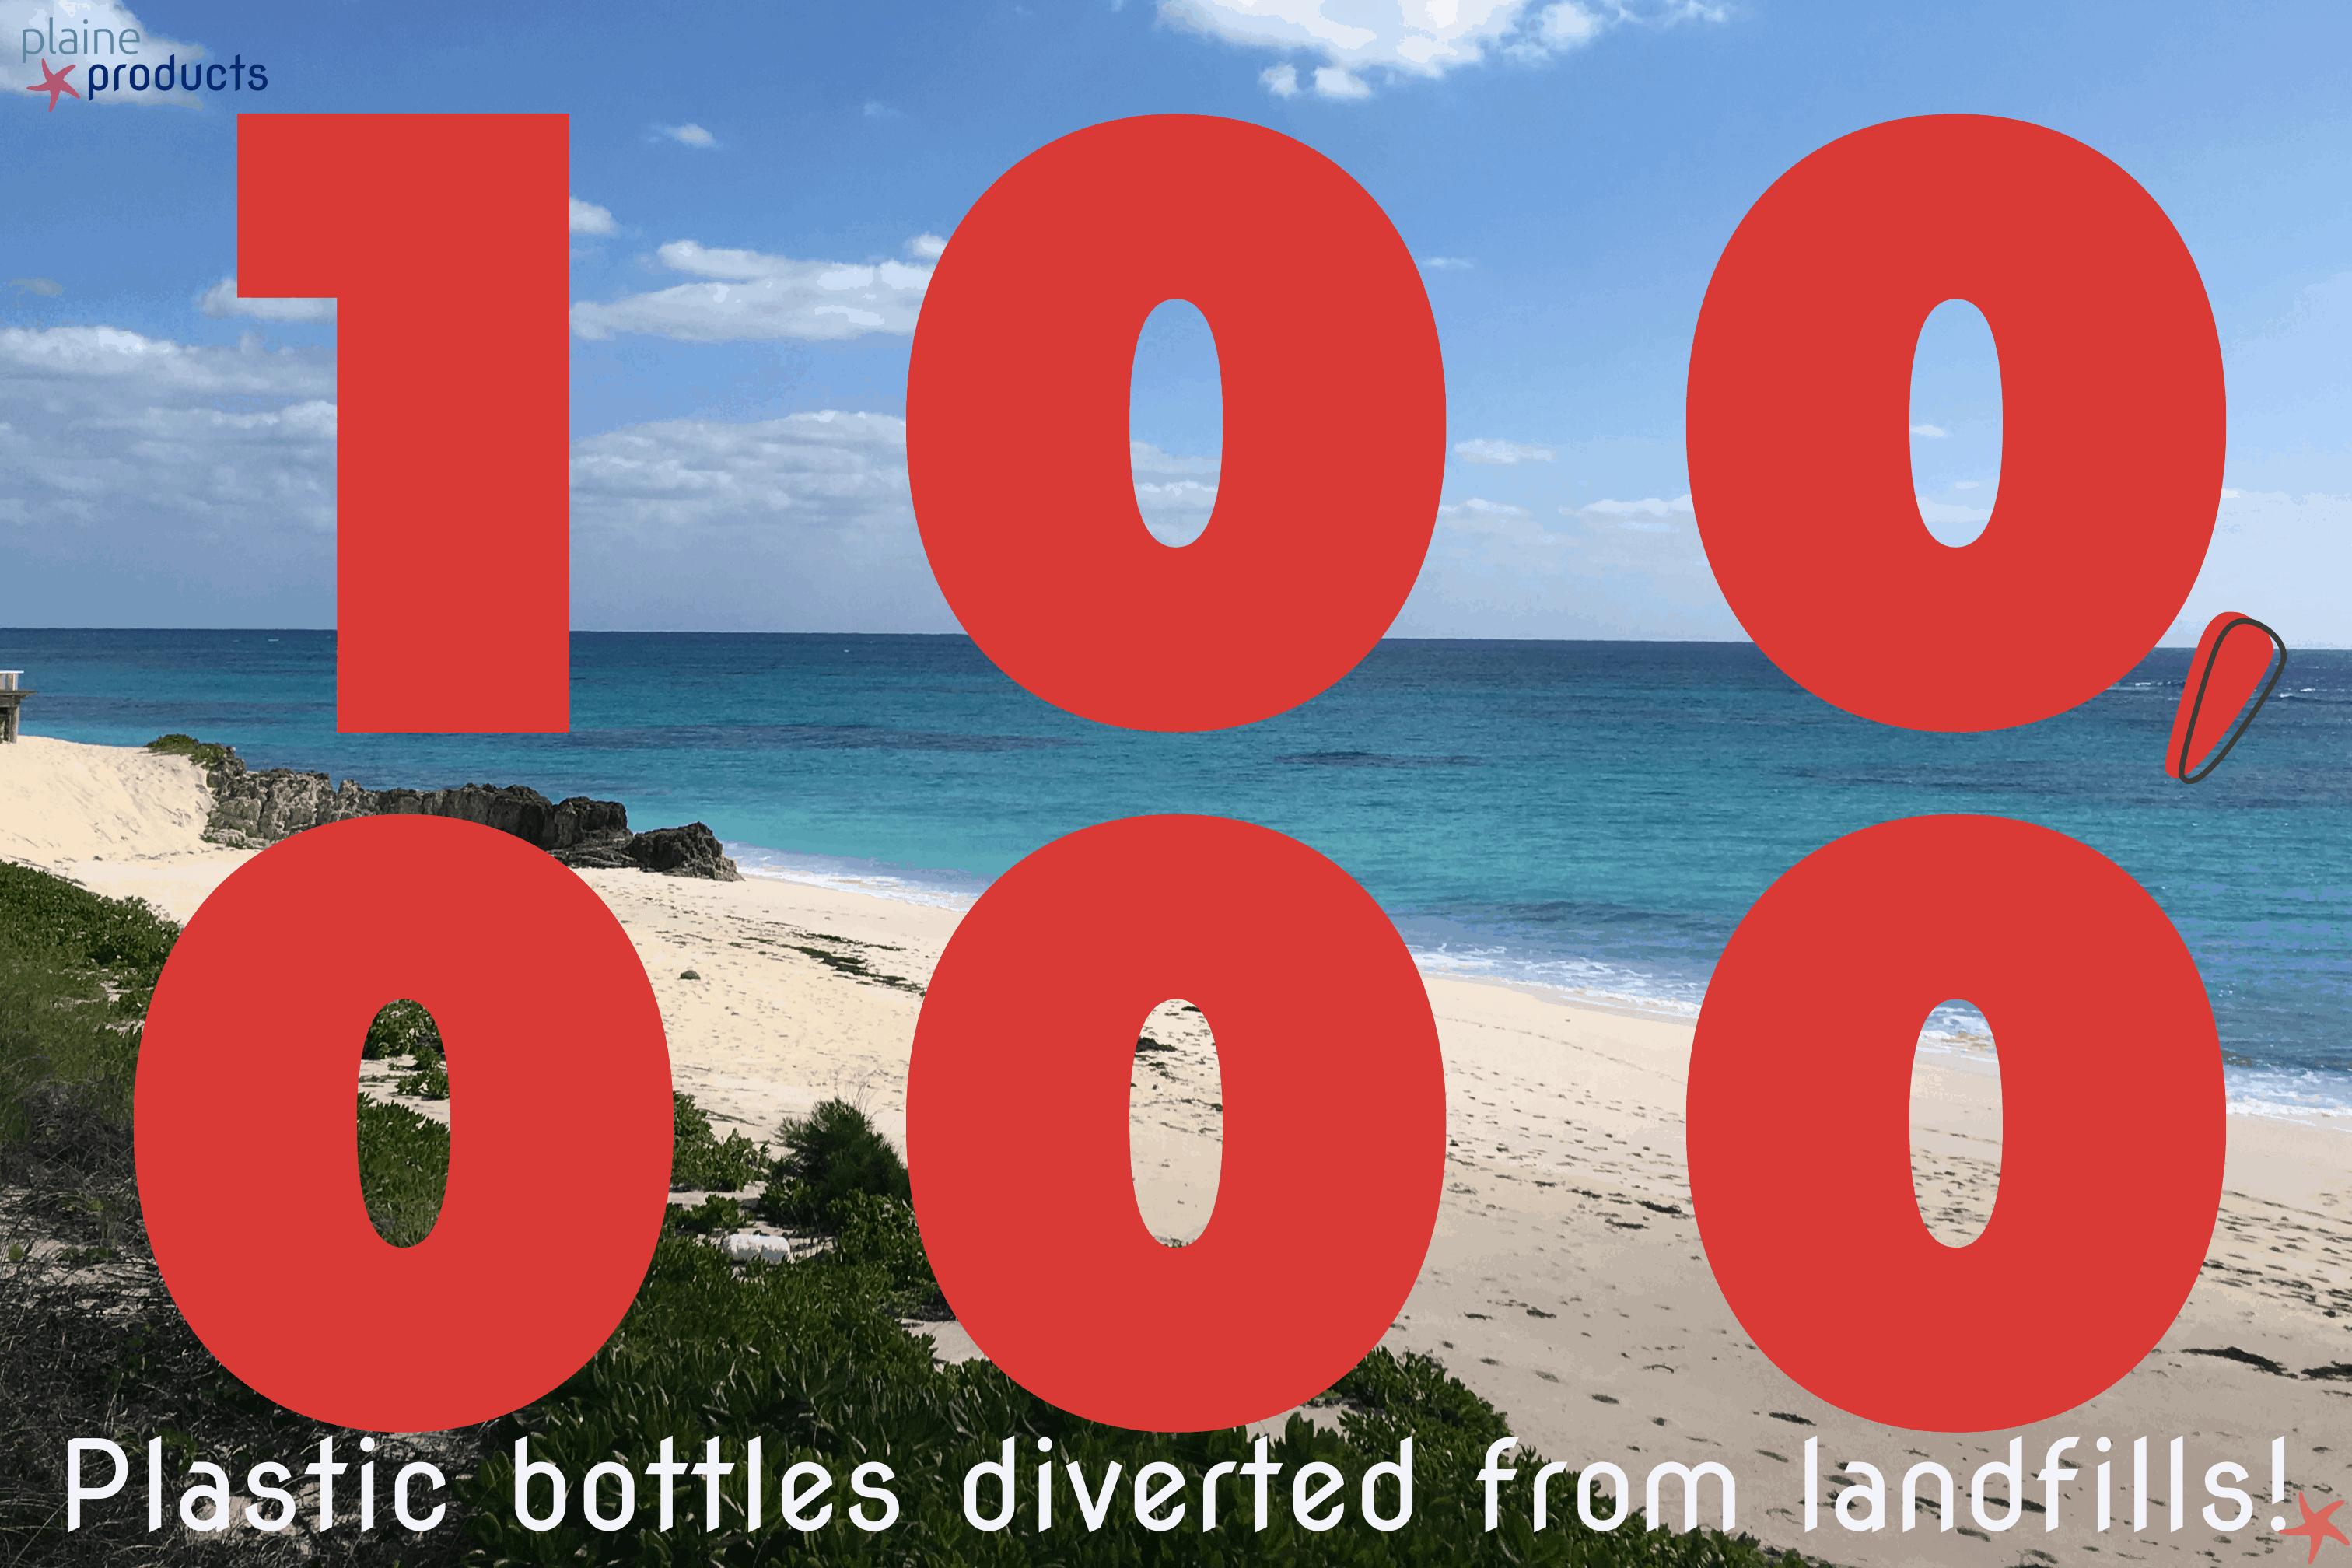 100,000 plastic bottles diverted from landfills!